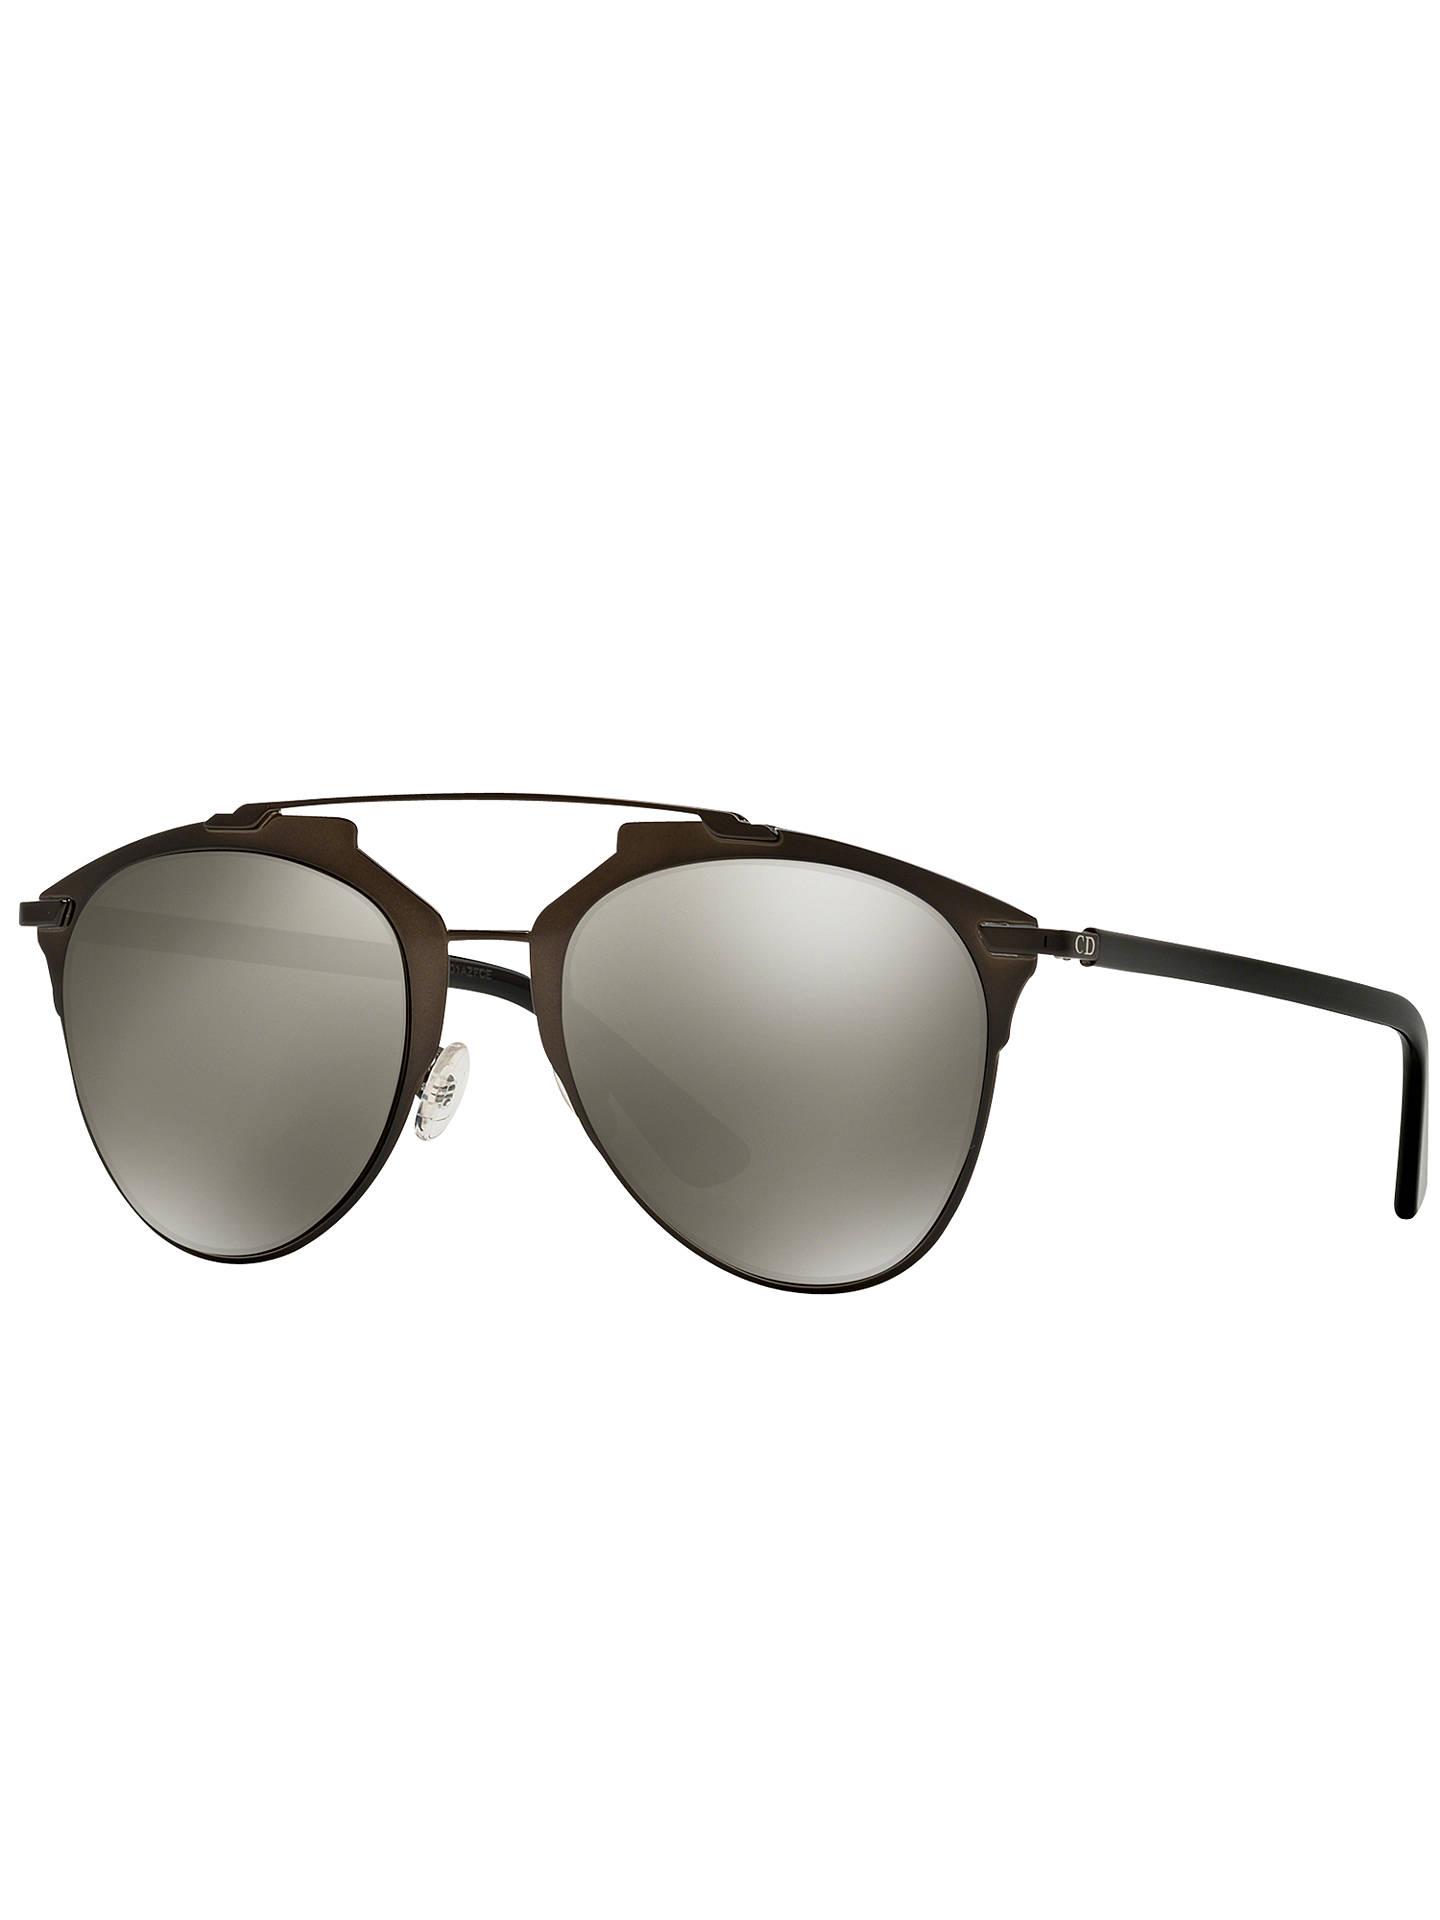 c96c4b9cde BuyDior CDM2P Reflected Sunglasses